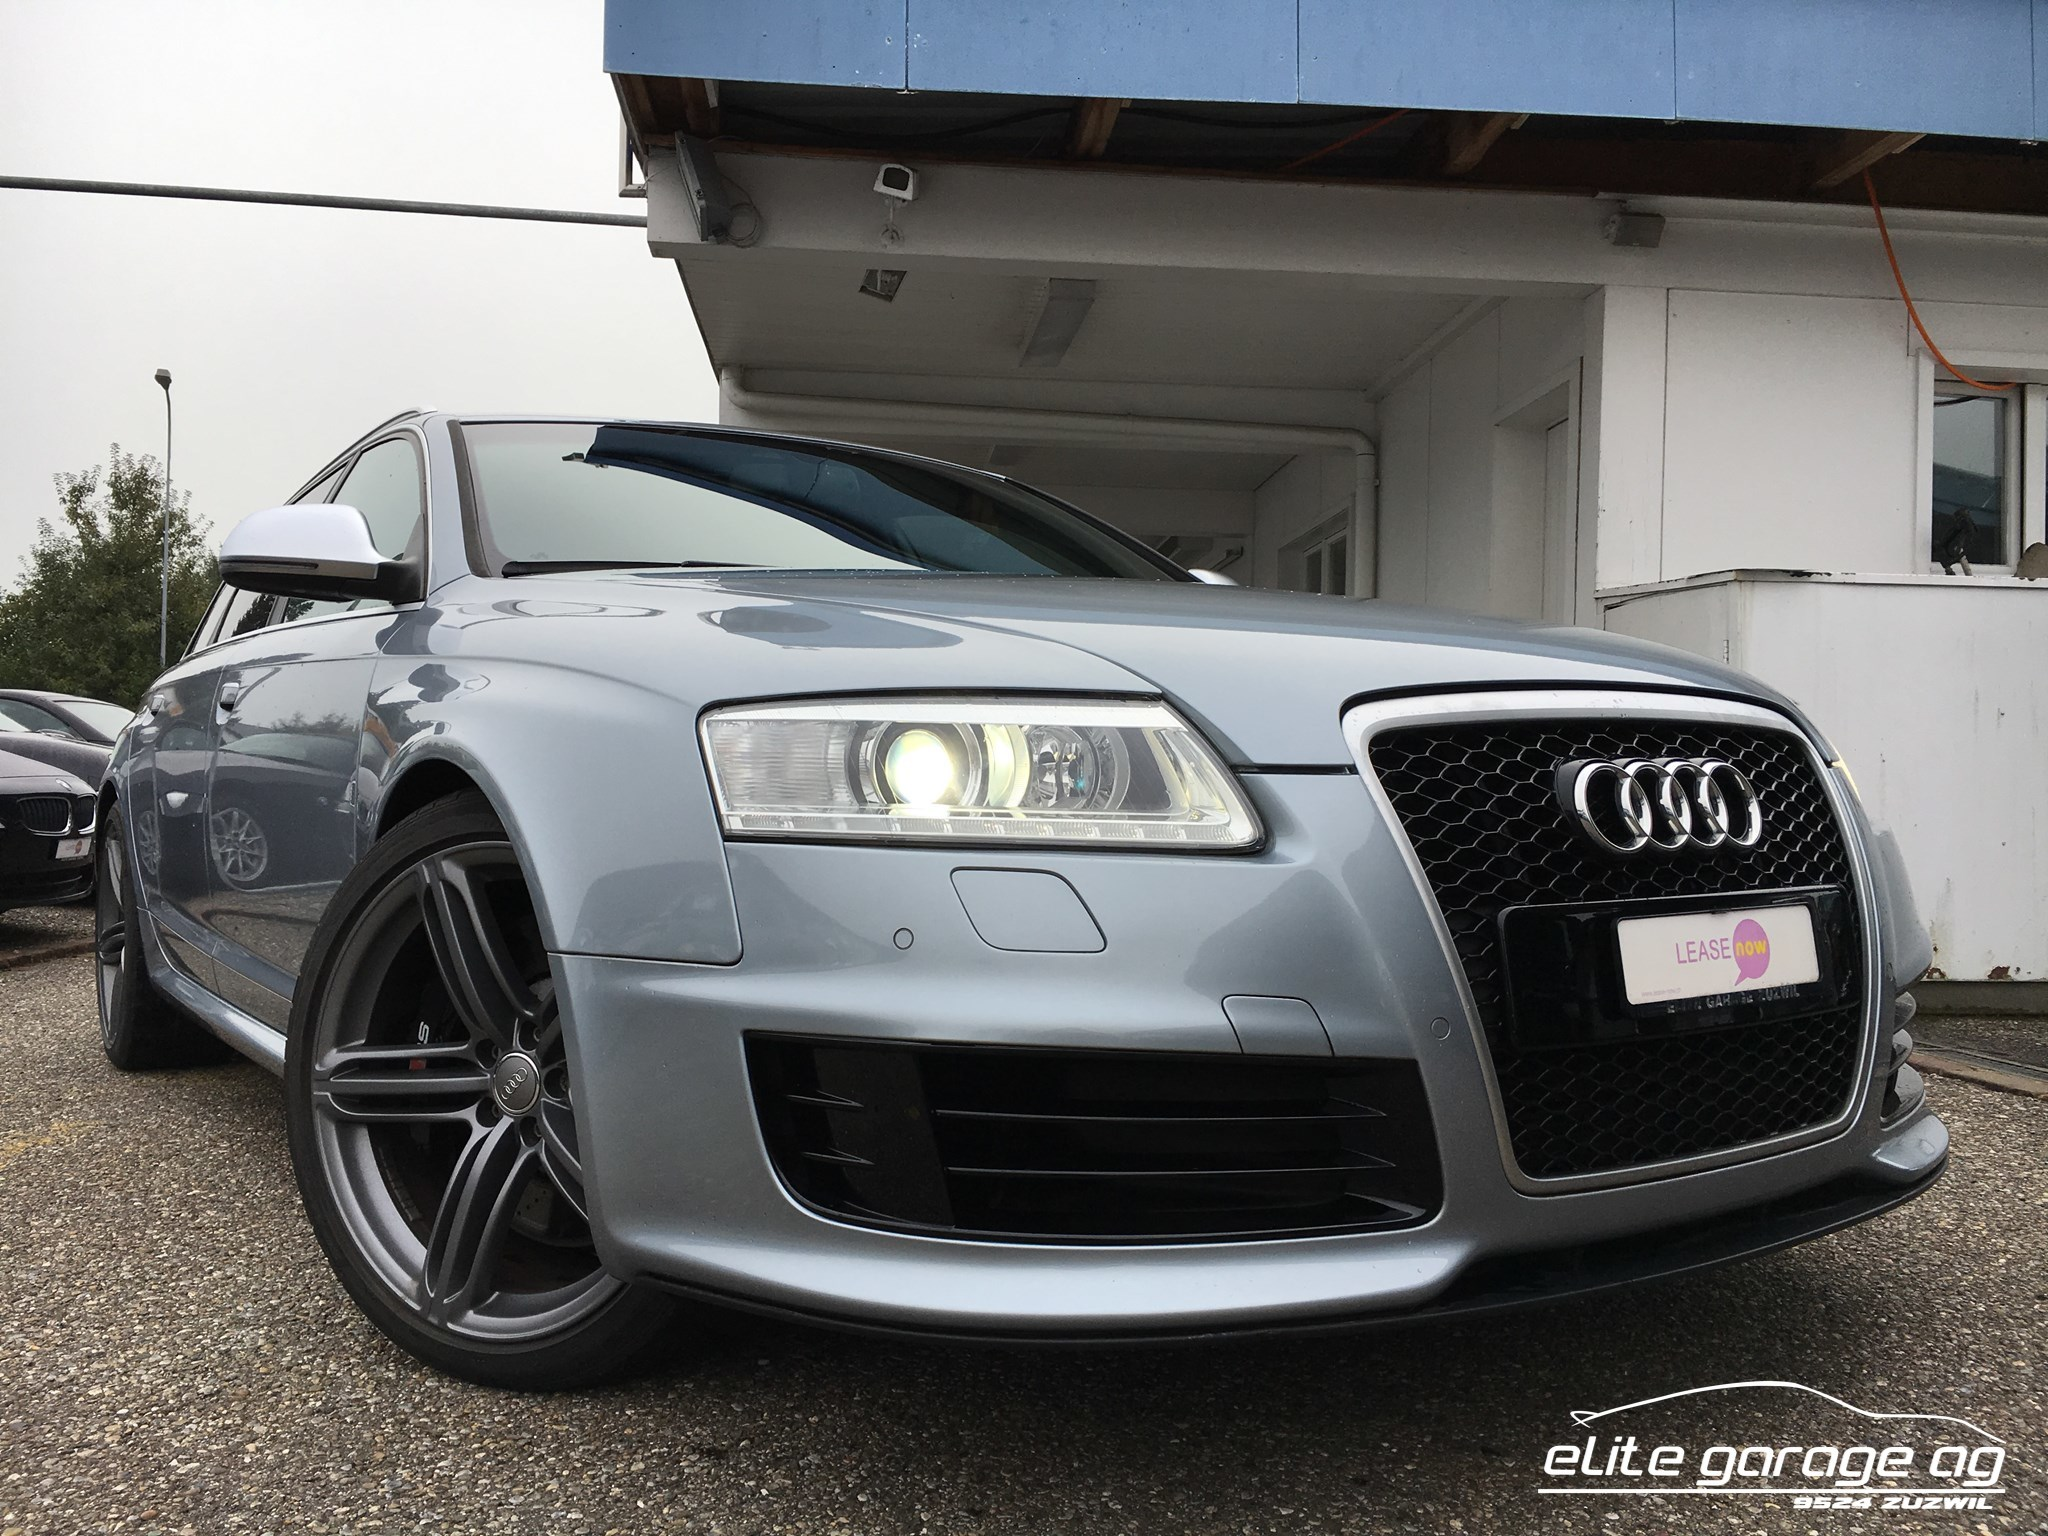 estate Audi S6 / RS6 RS6 Avant 5.0 V10 quattro